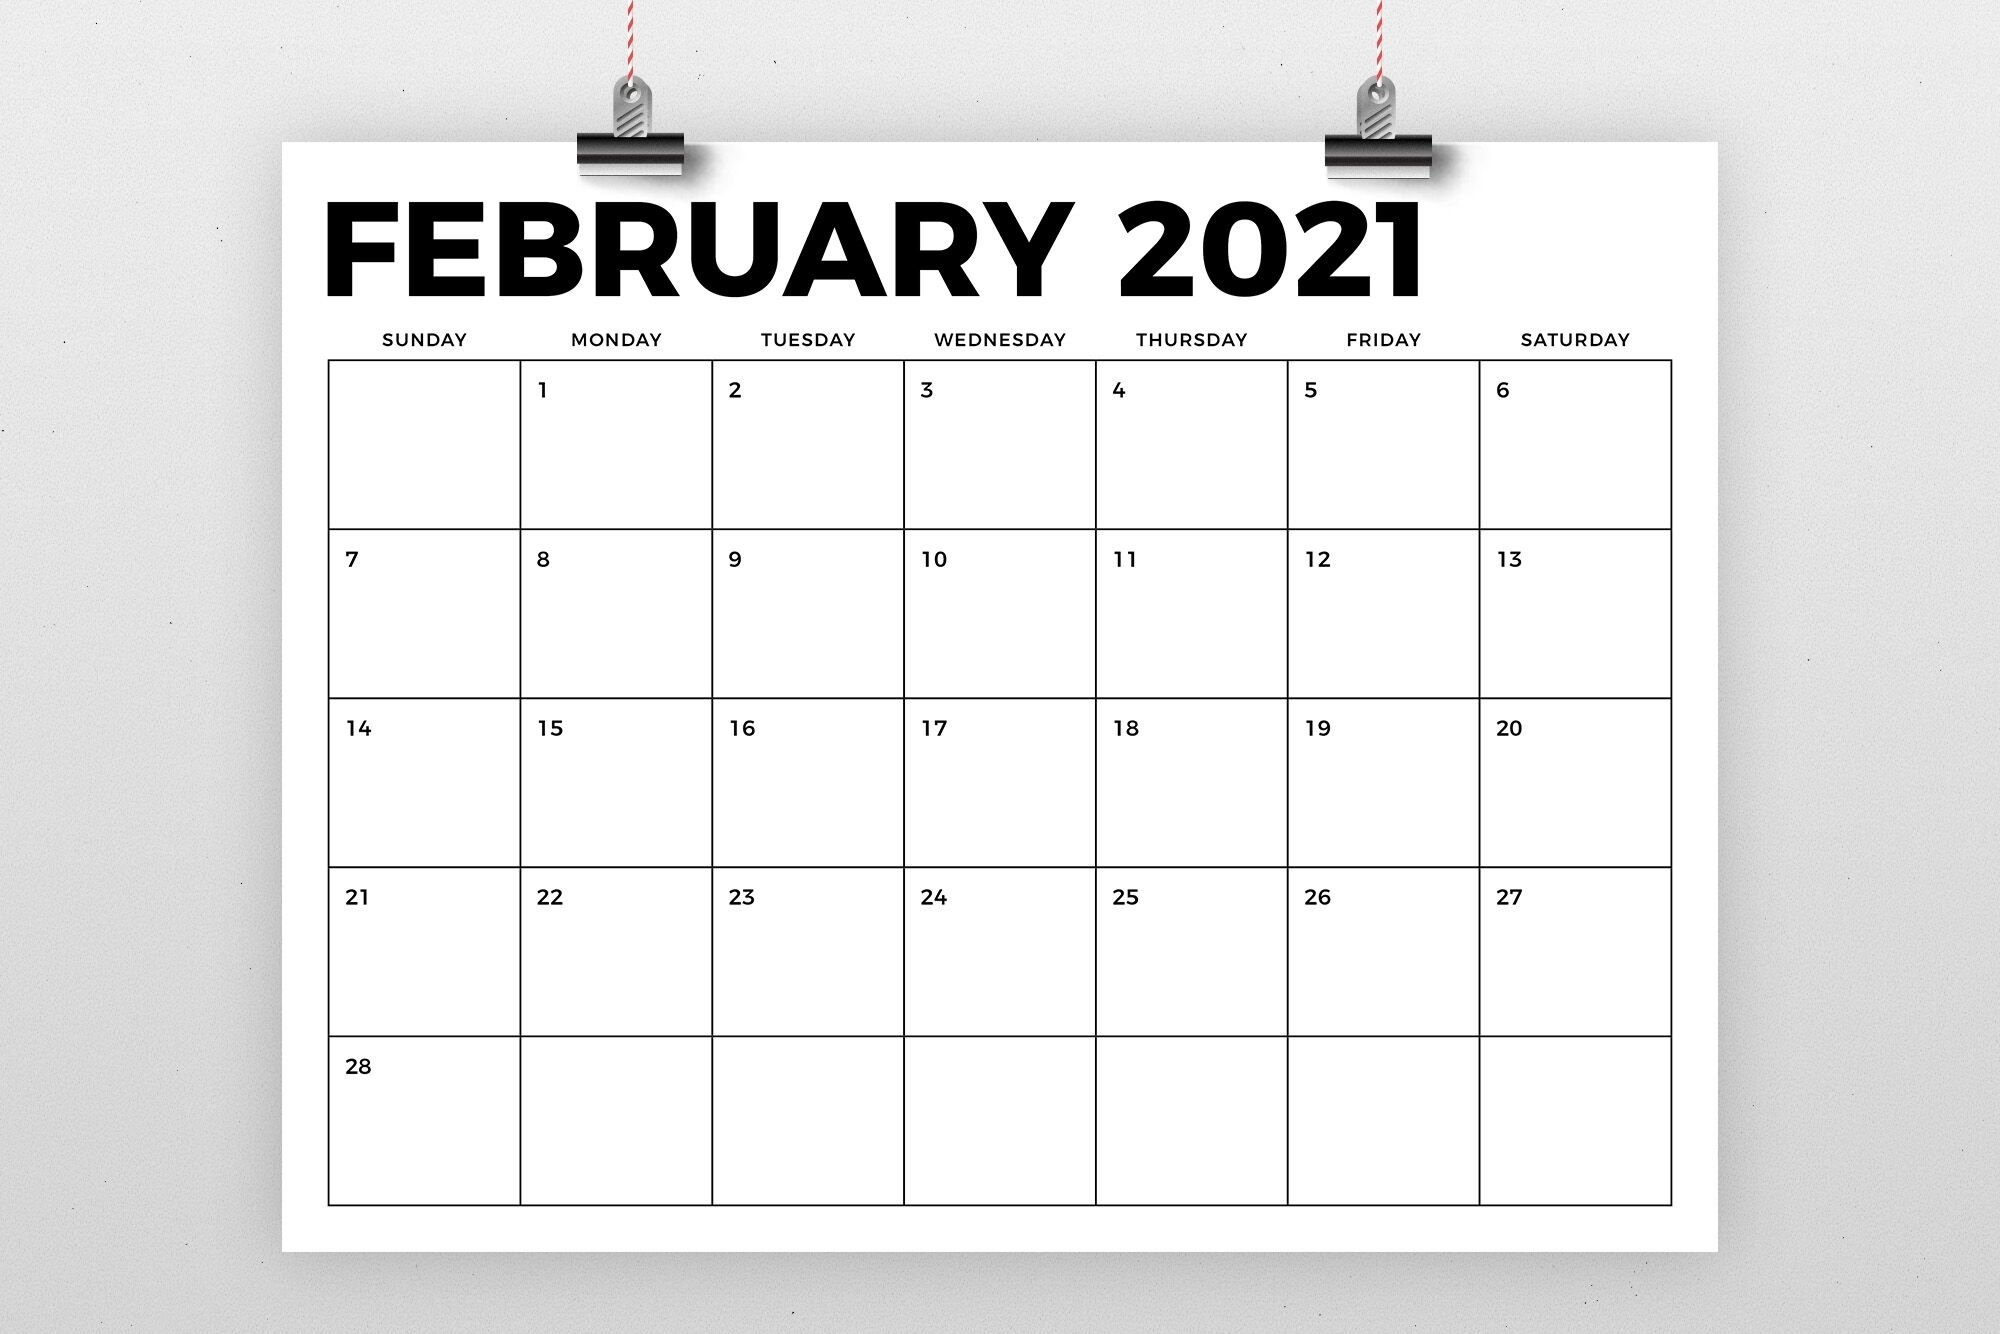 8 X 11 Printable Calendar 2021 | Calendar Template 2021 for Free Printable Monthly Calendar 2021 With Lines Image